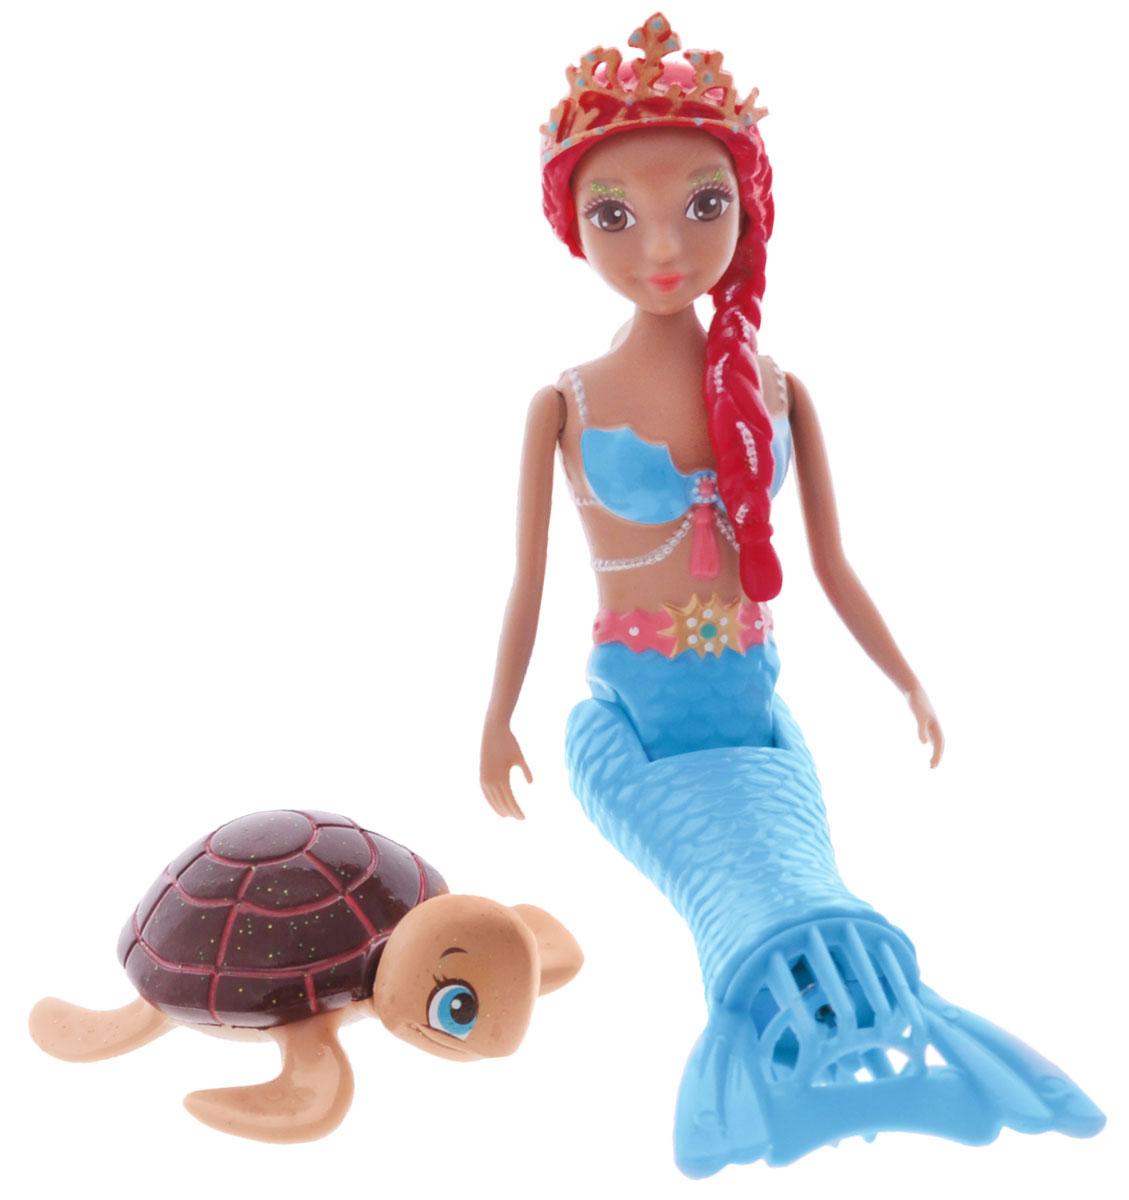 Redwood Мини-кукла Танцующая русалочка Амелия